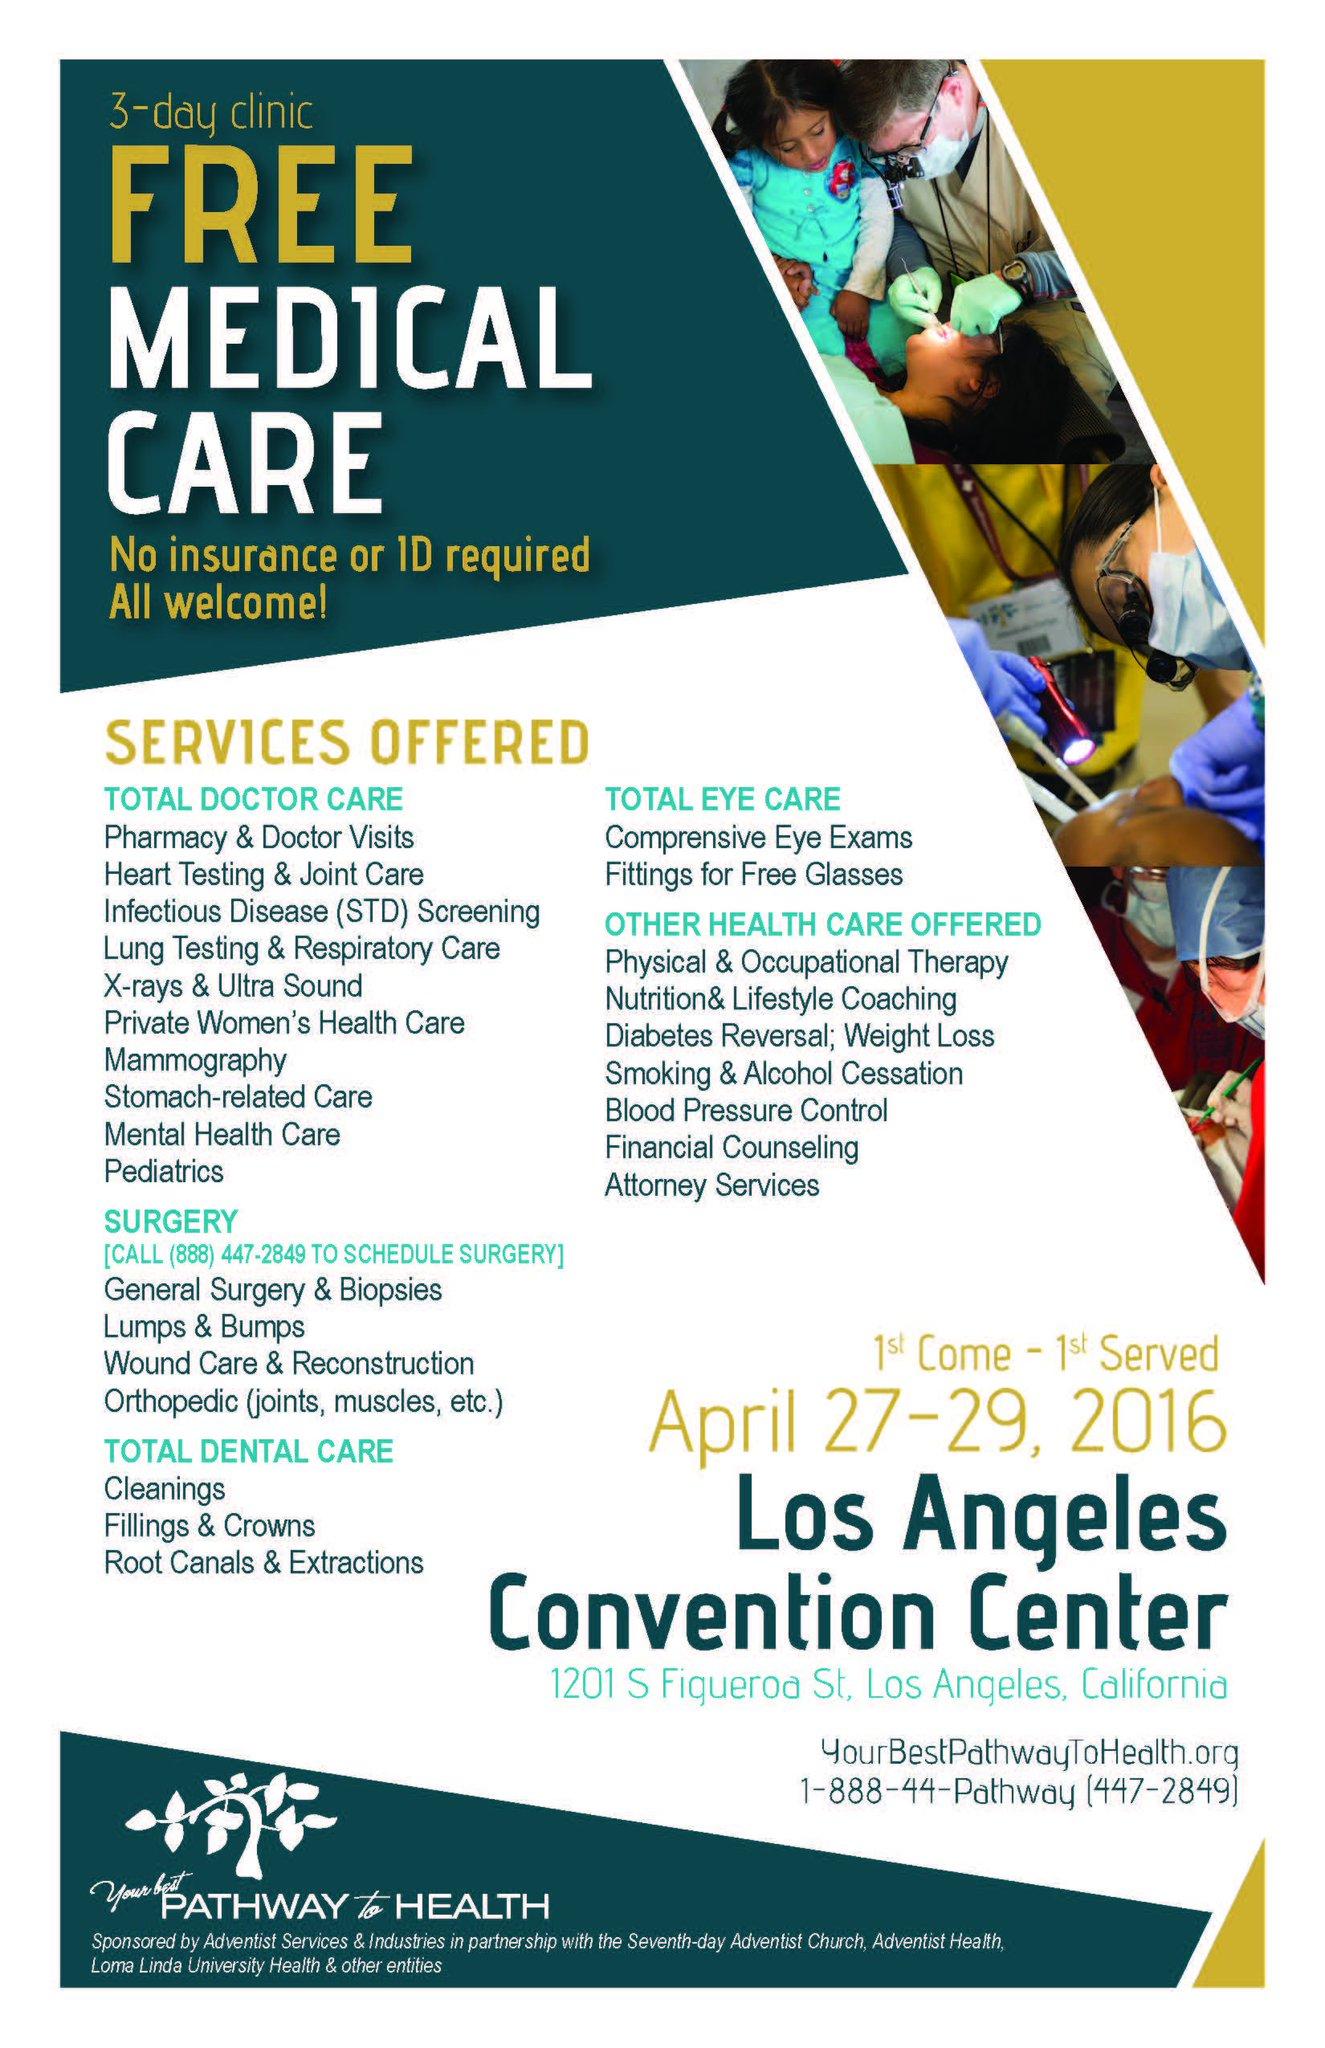 La Convention Center On Twitter La Residents A Free Mega Medical